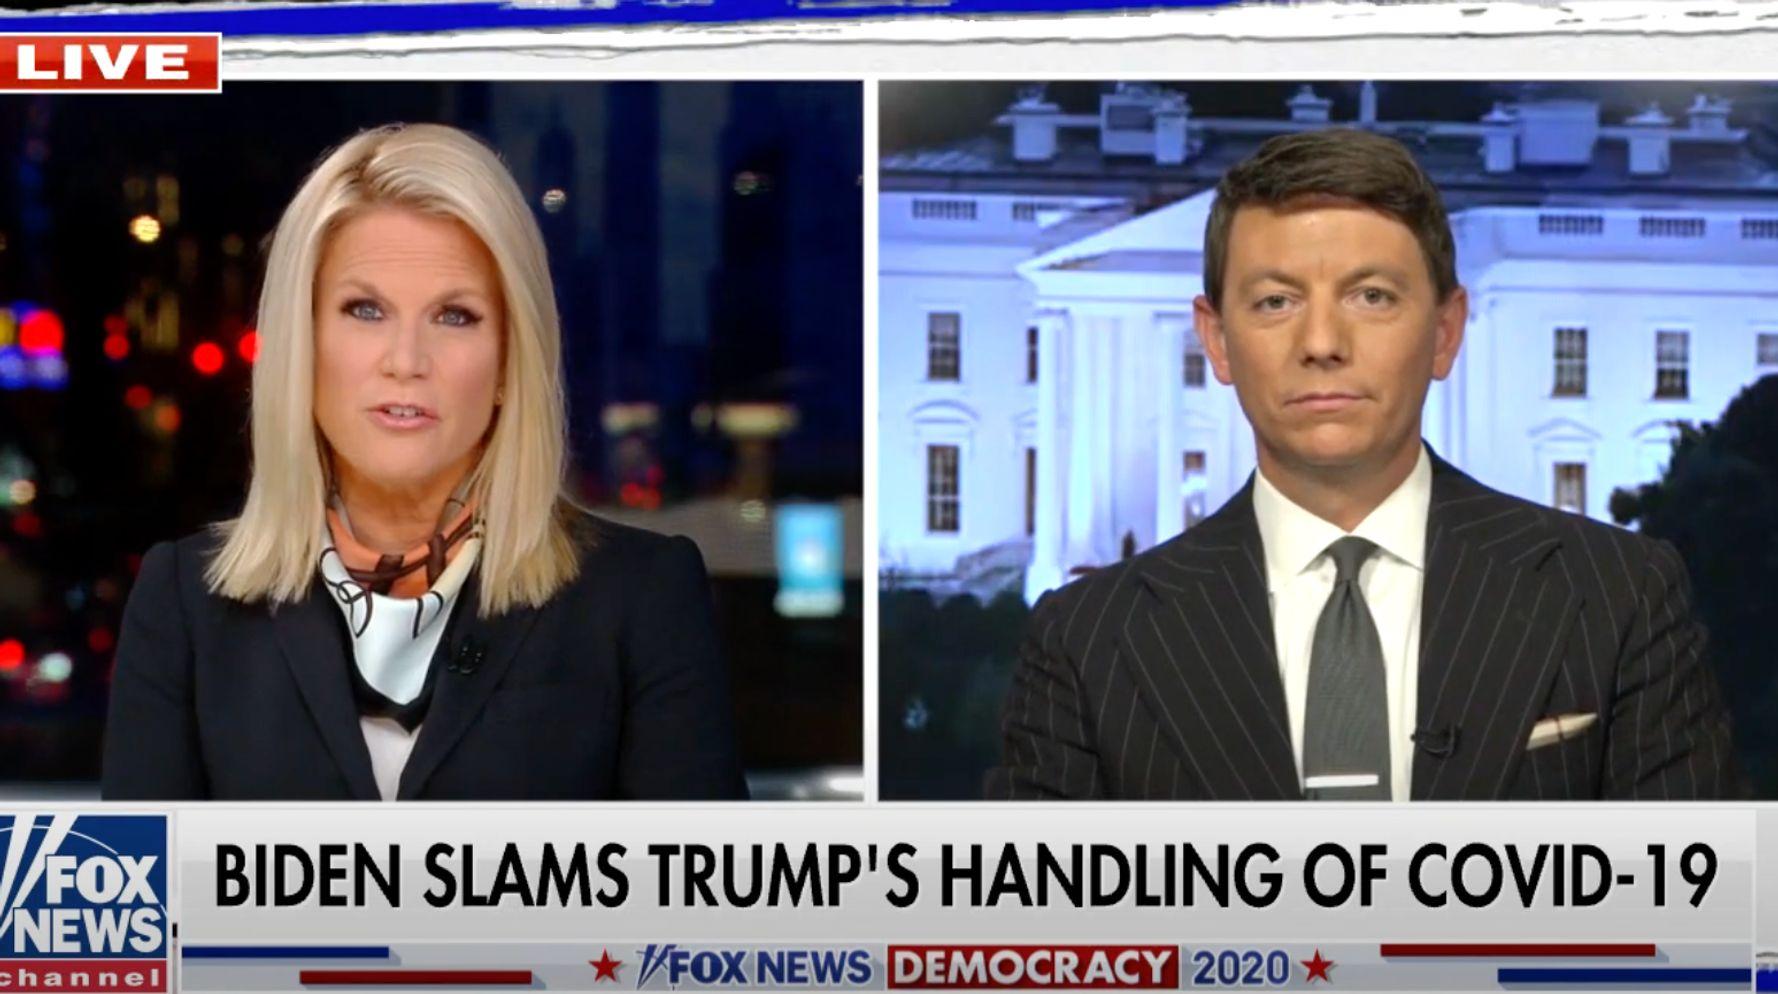 Fox News Host Asks Trump Official If It's A Good Idea To Call Disease Experts 'Idiots'